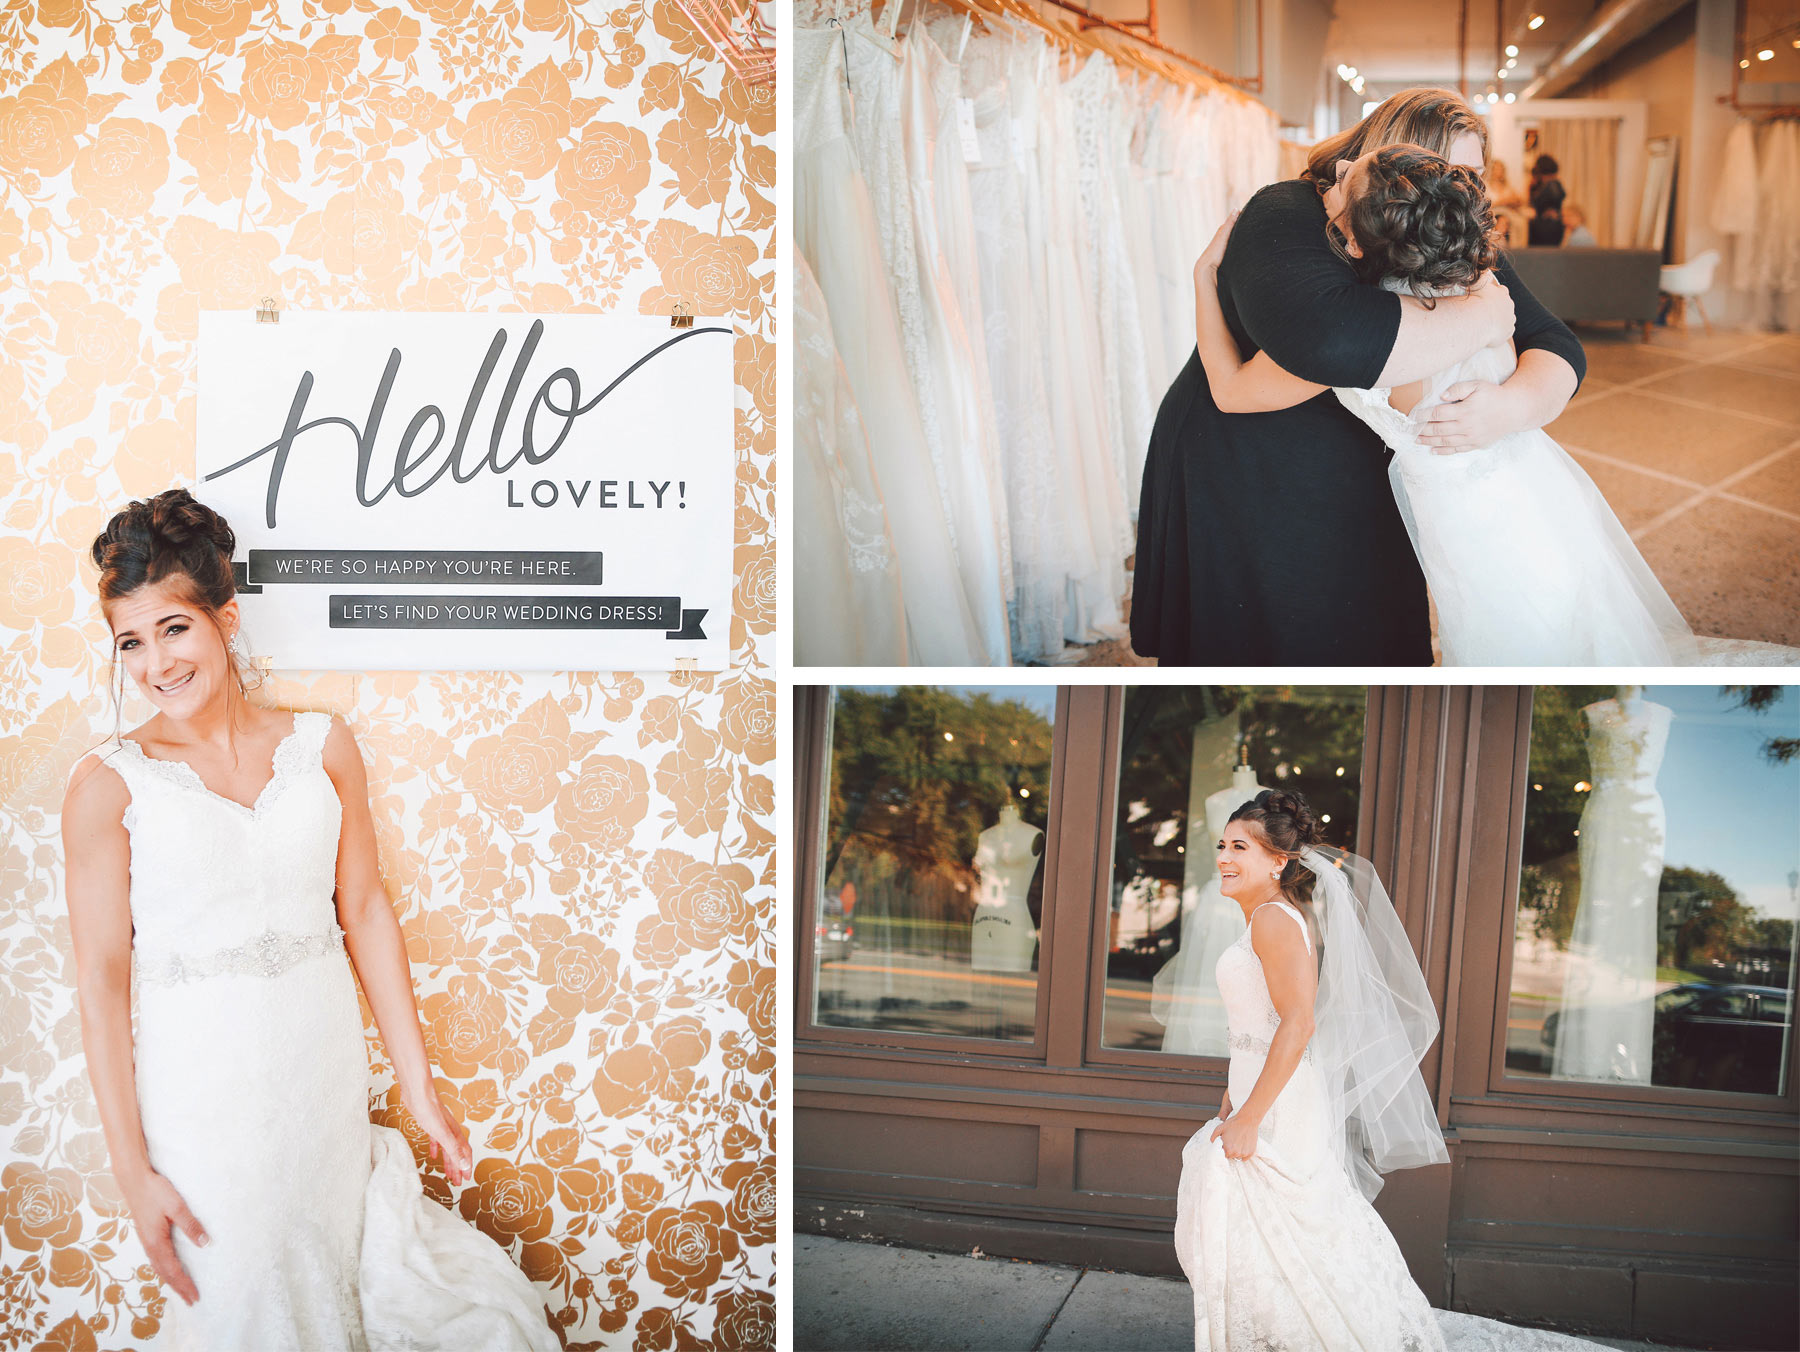 12-Minneapolis-Minnesota-Wedding-Photographer-by-Andrew-Vick-Photography-Fall-Autumn-Loring-Park-A-Be-Bridal-Shop-Bride-Dress-Stylist-Vintage-Paula-and-Jason.jpg